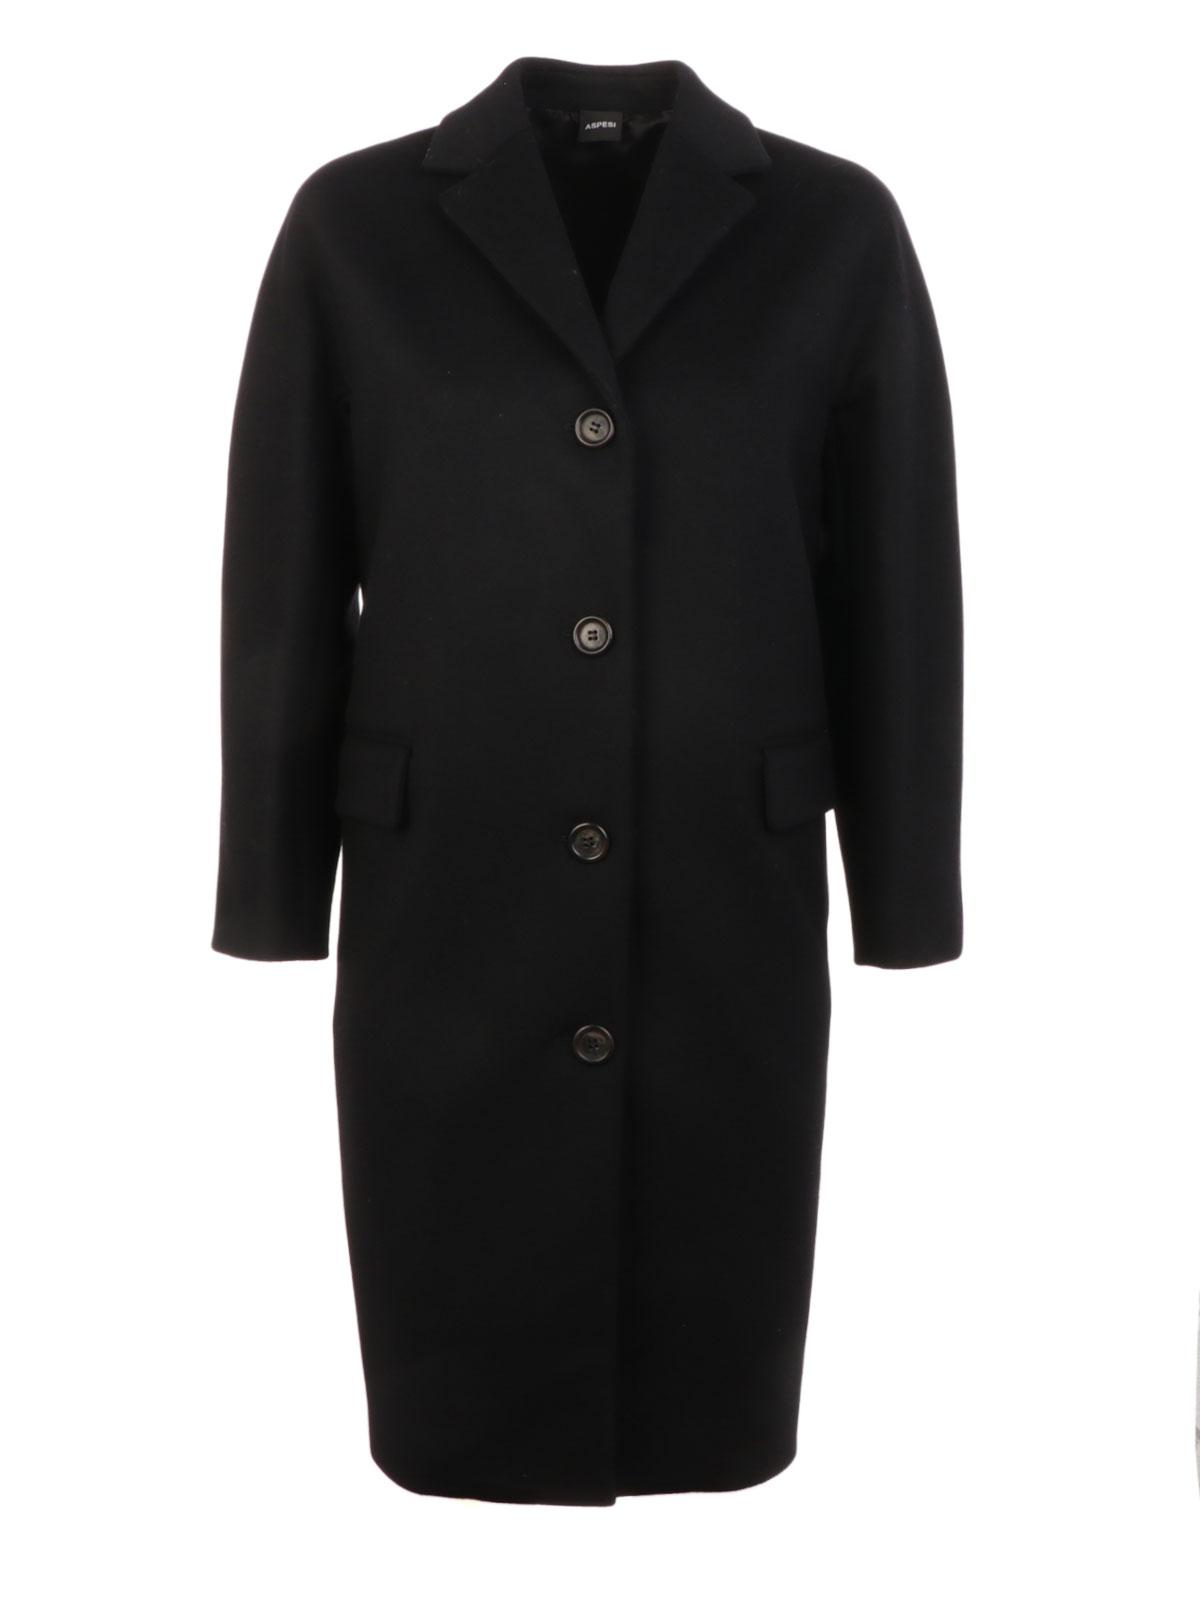 detailed look 689e1 b255d ASPESI Women's Cashmere Wool Coat